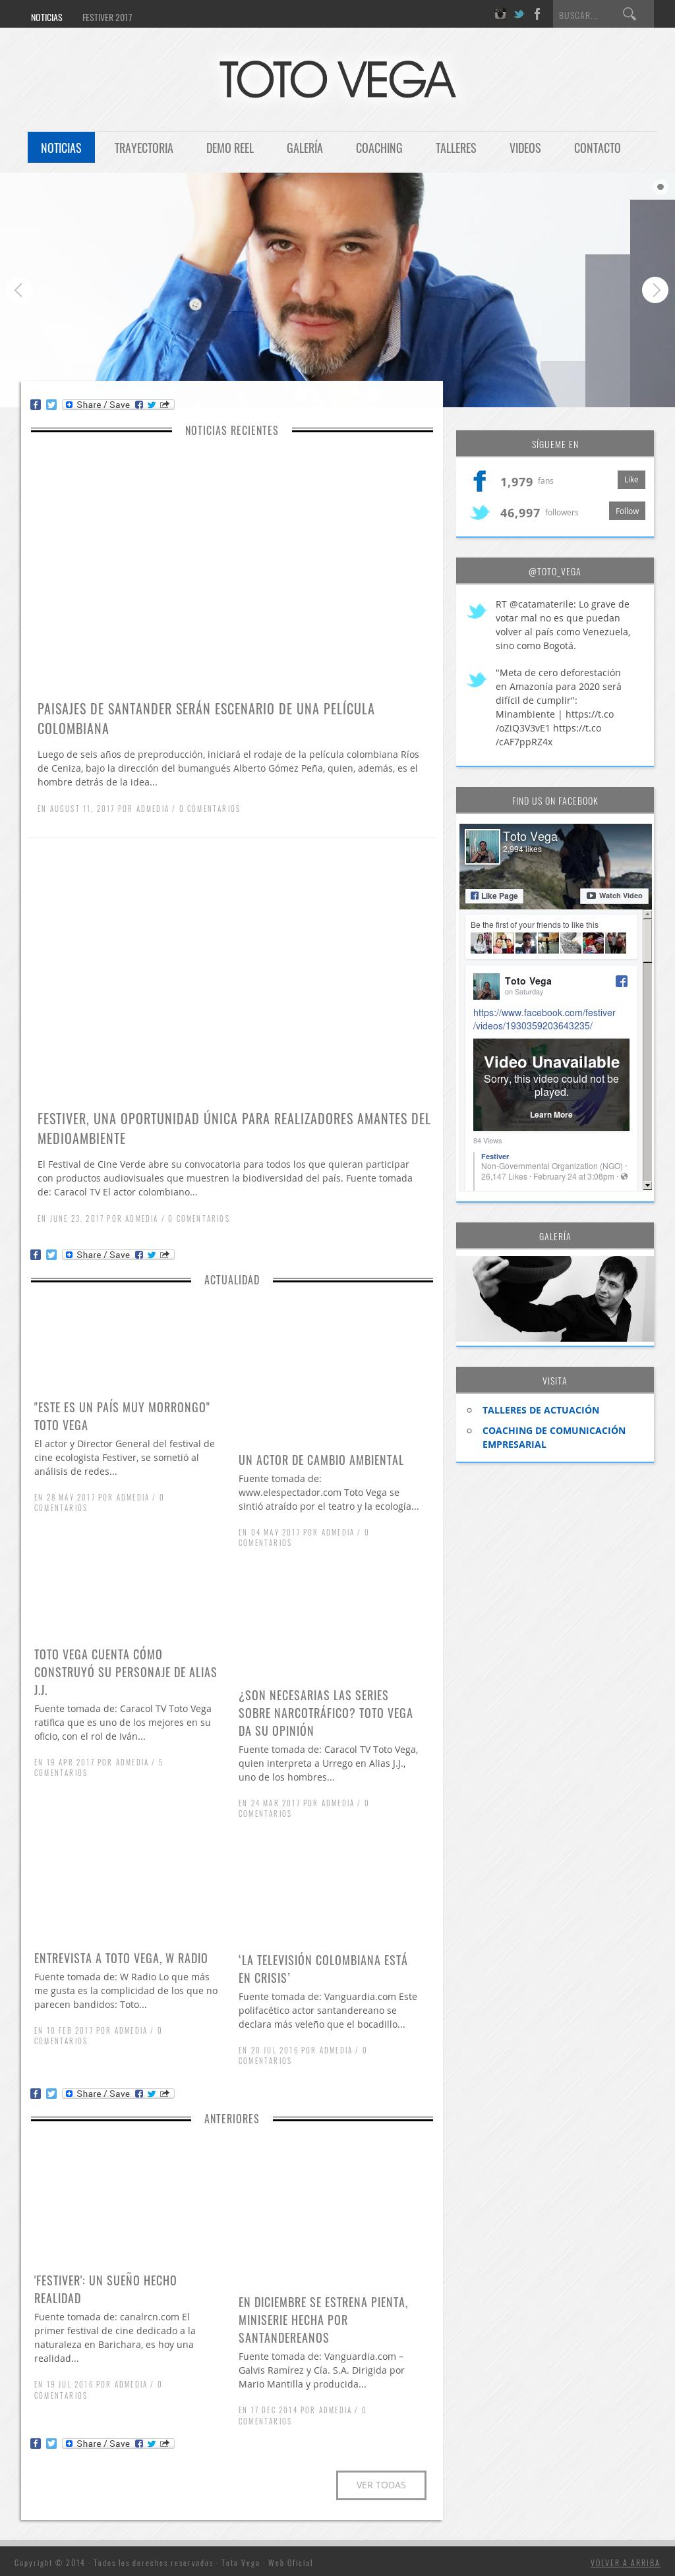 Toto Vega Competitors, Revenue and Employees - Owler Company Profile